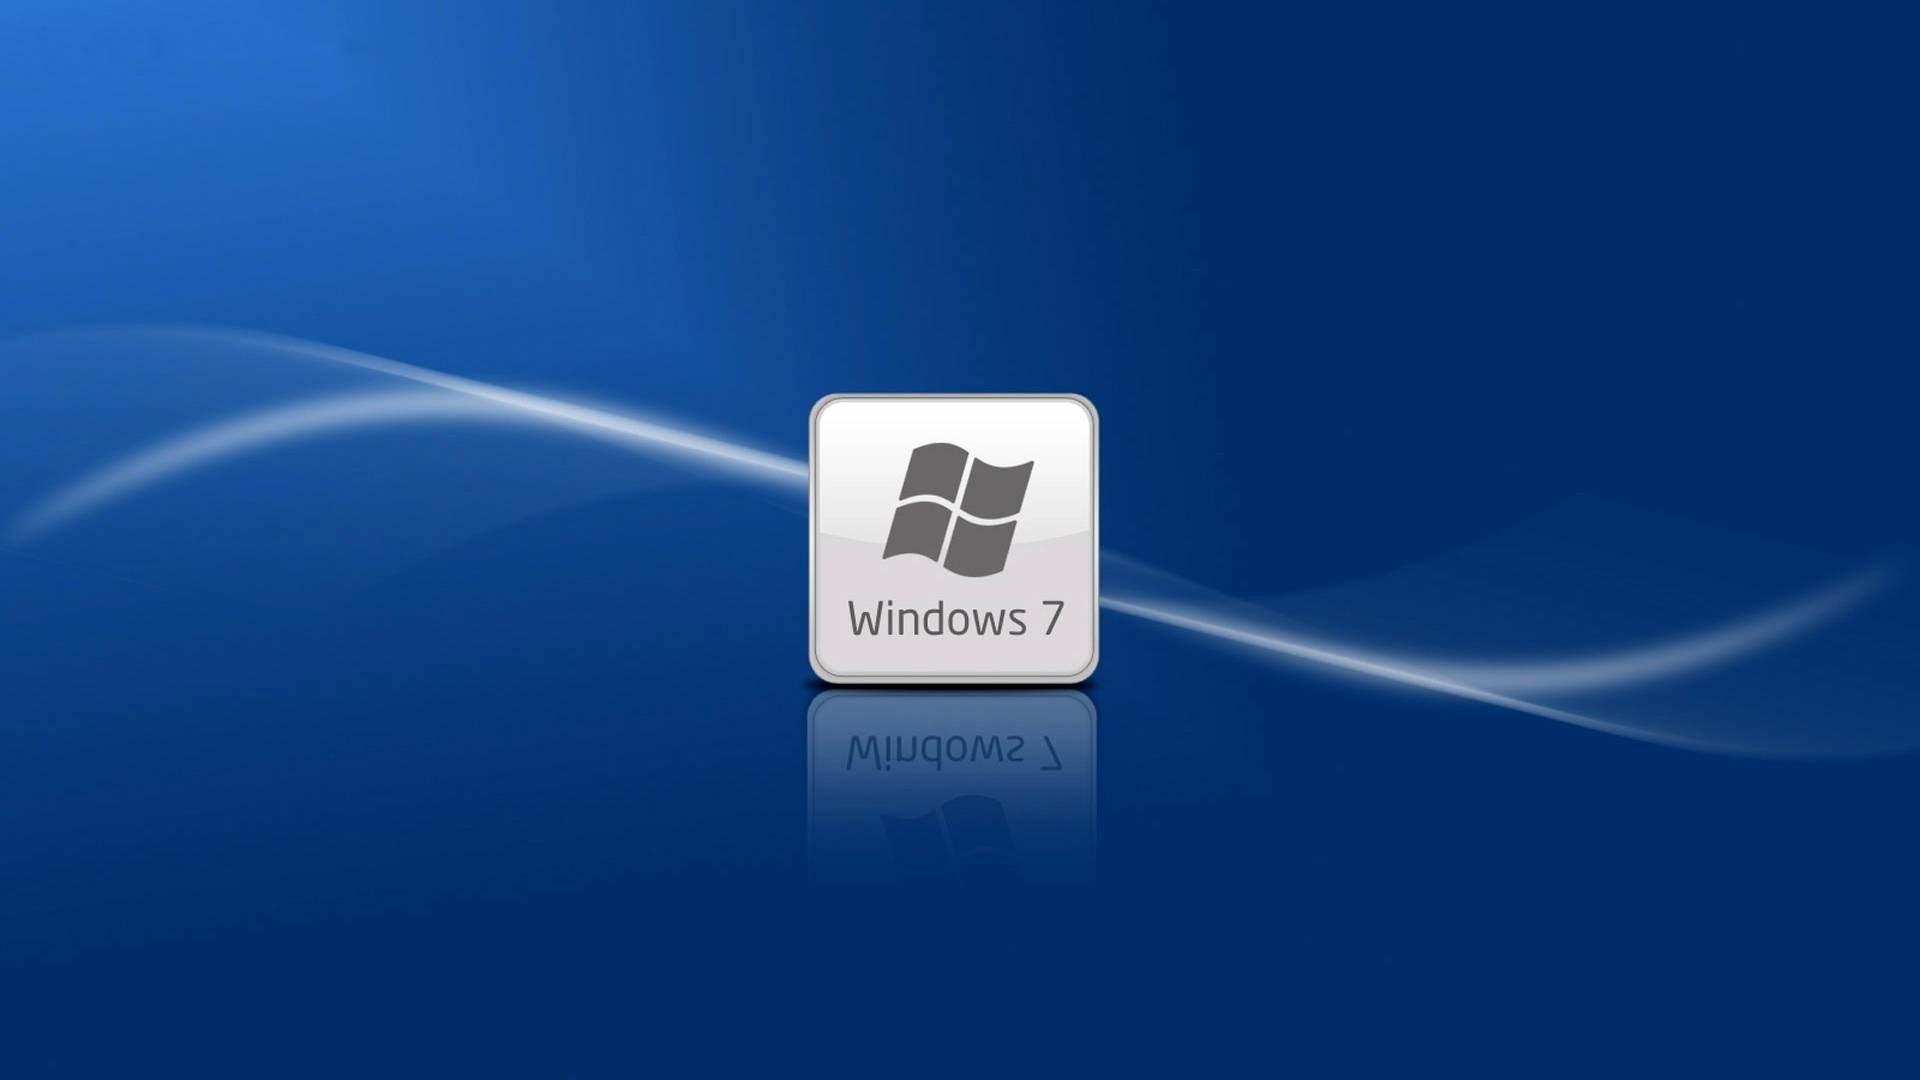 Most Inspiring Wallpaper High Quality Windows 7 - 1068943-windows-7-hd-wallpapers-1920x1080-ipad  Pic_166367.jpg